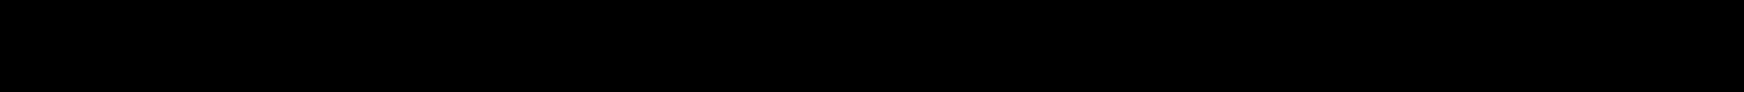 AmplitudeGR-ExtraCompMedium.otf